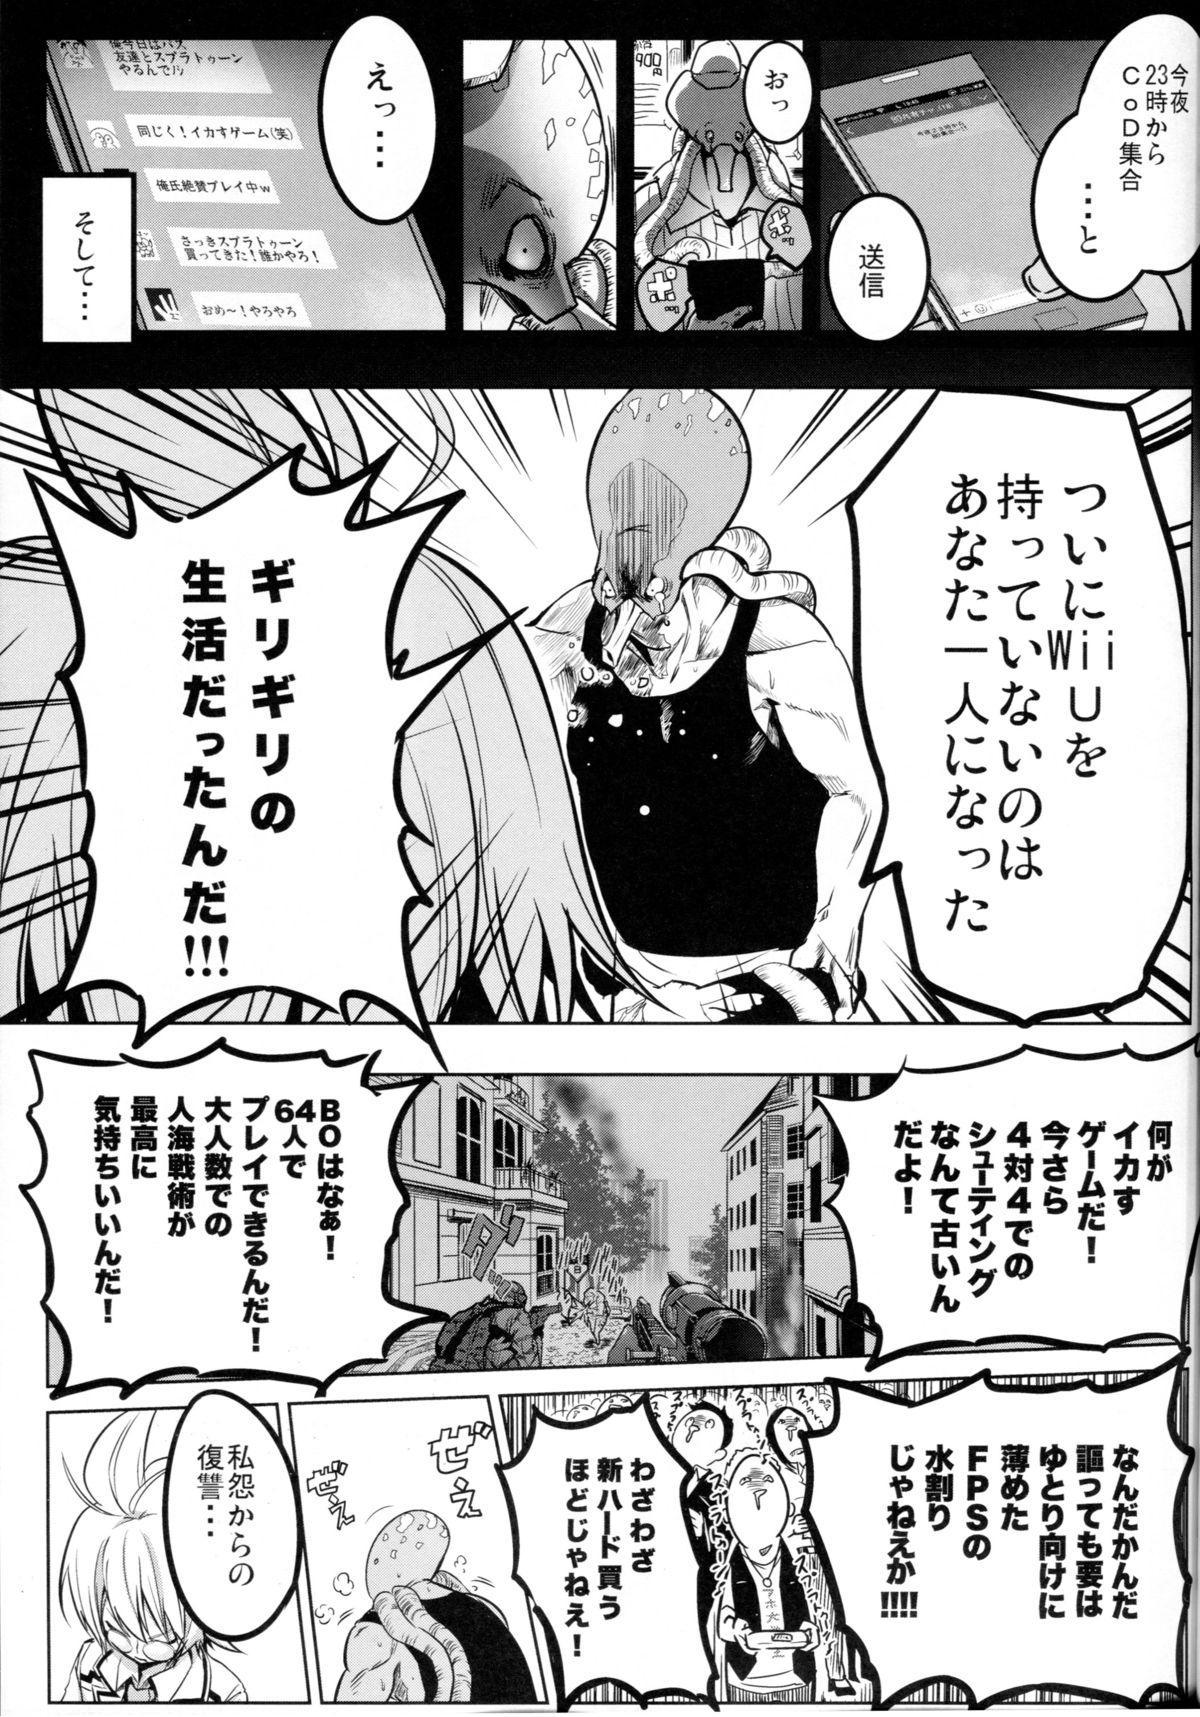 Saredo Uraraka ni! Ikari no Gachimacchi - Still Behave Uraraka! 18